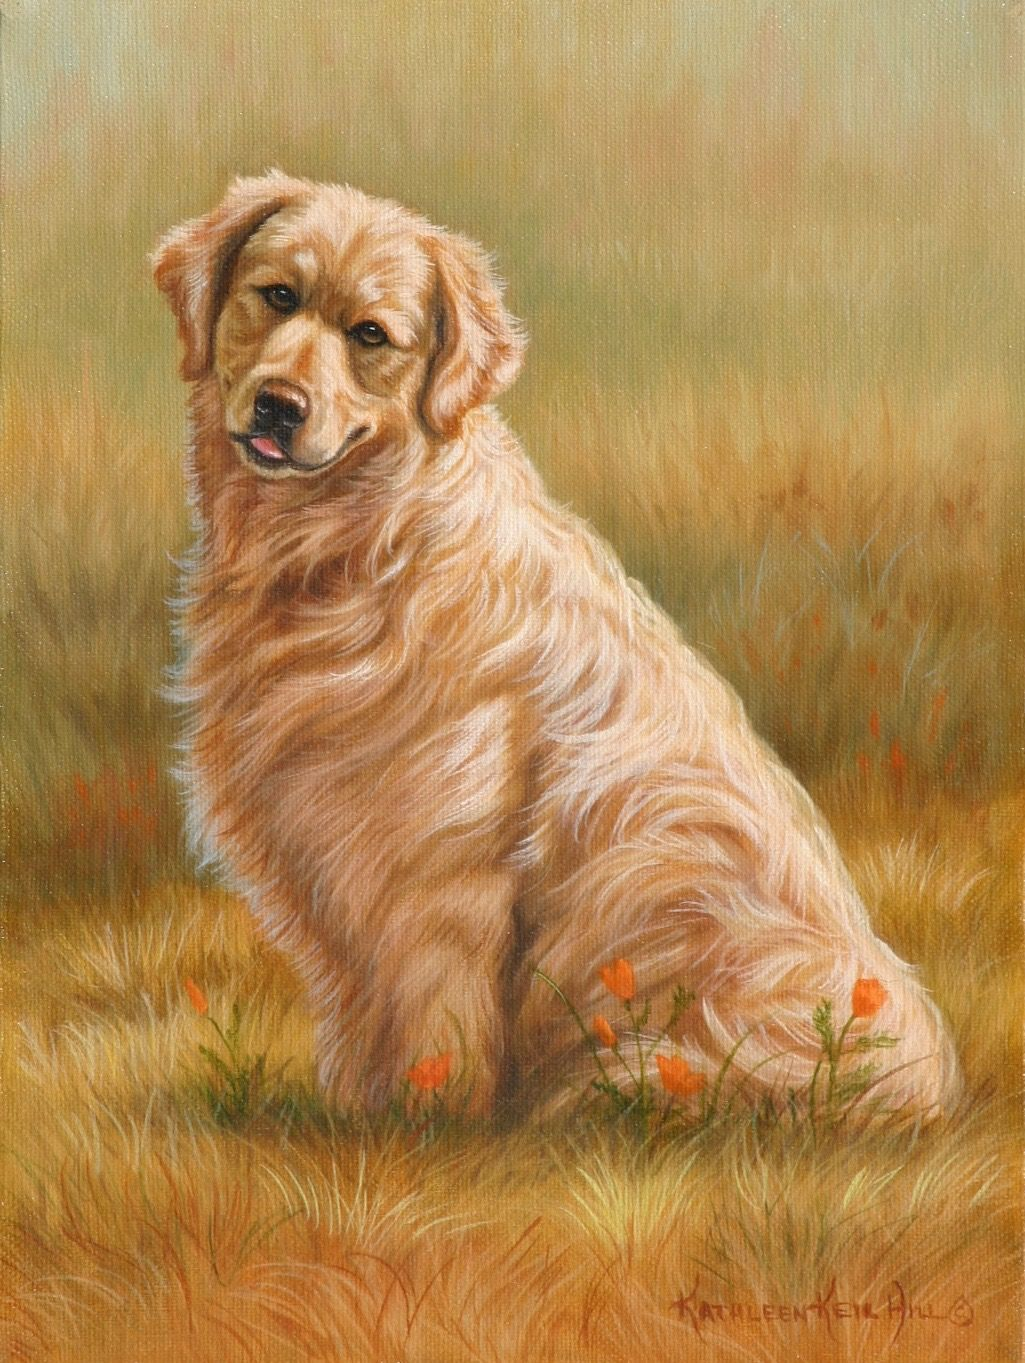 A Golden Glow 9 X 12 Oil On Canvas Of A Golden Retriever Sitting